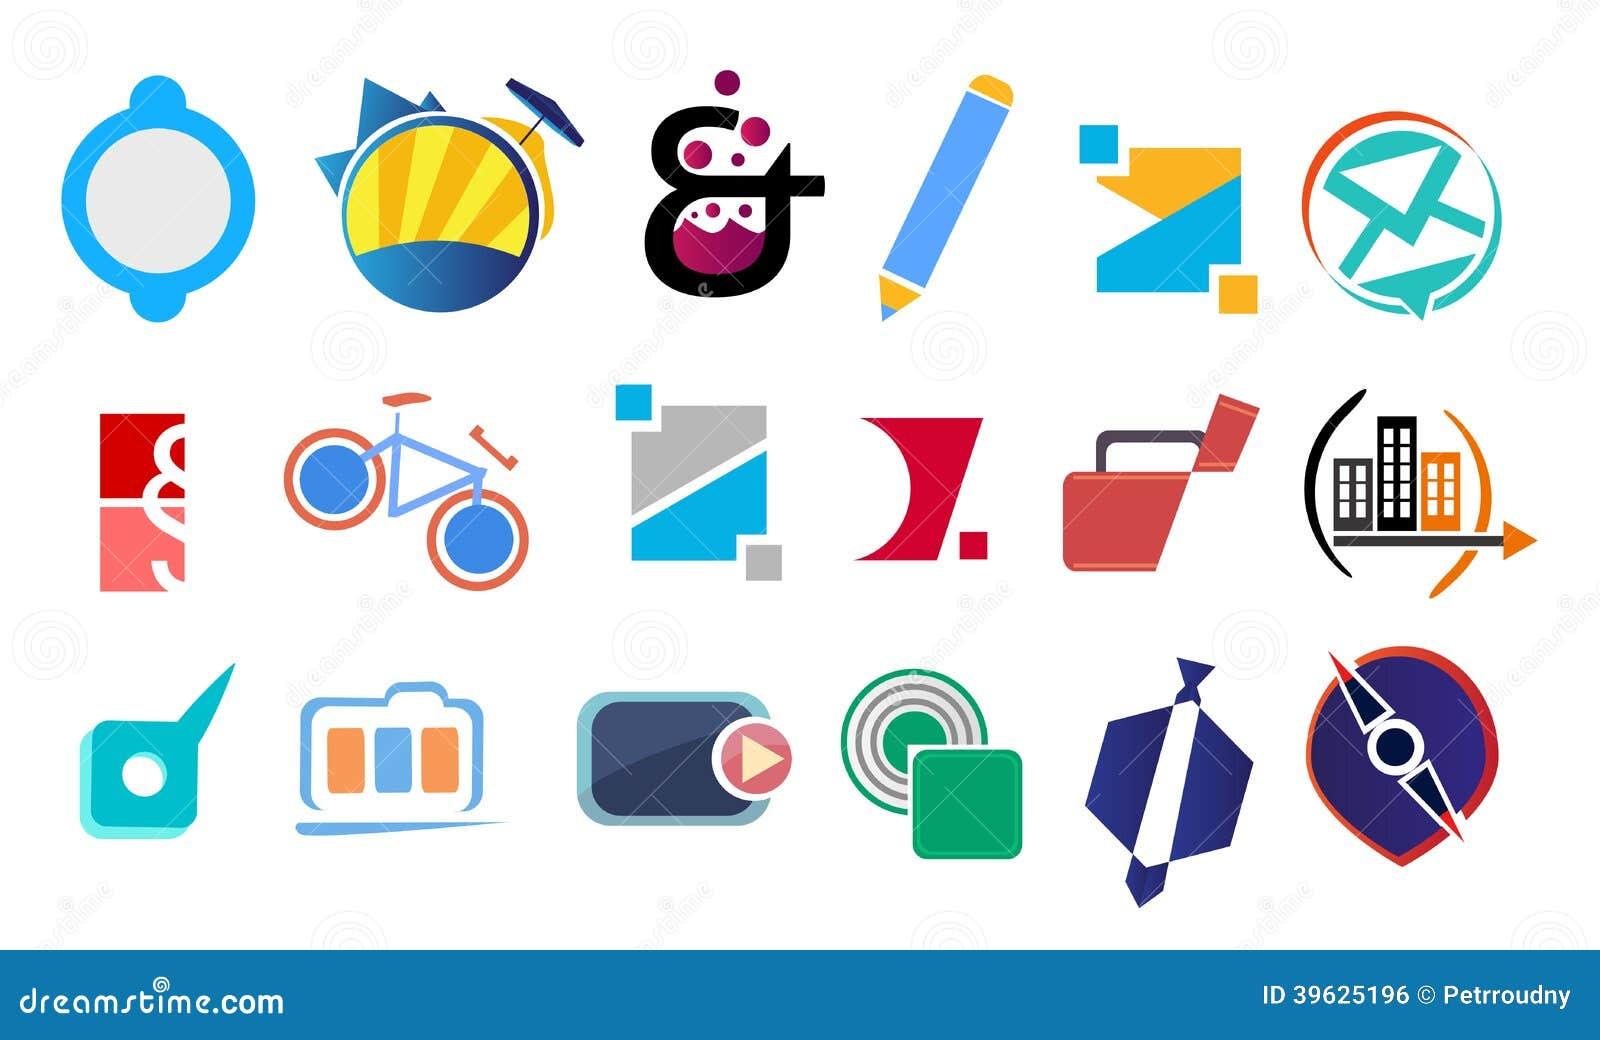 Logo Design Tutorial How To Create An Iconic Logo Design